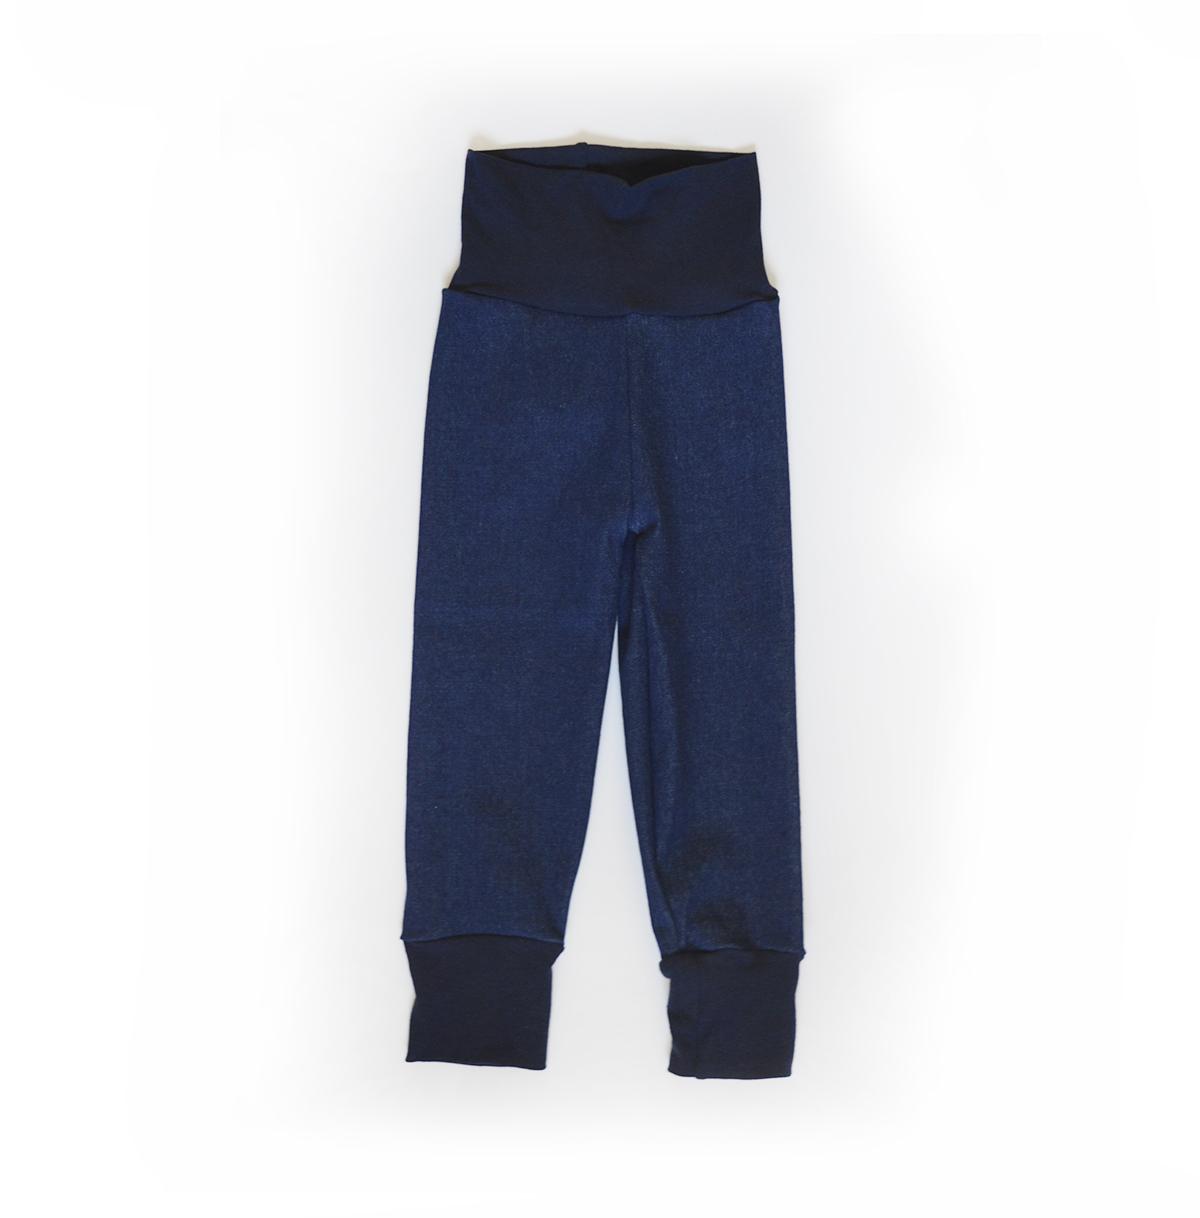 Little Sprout Pants™ Stretch Denim - Regular Fit 00500